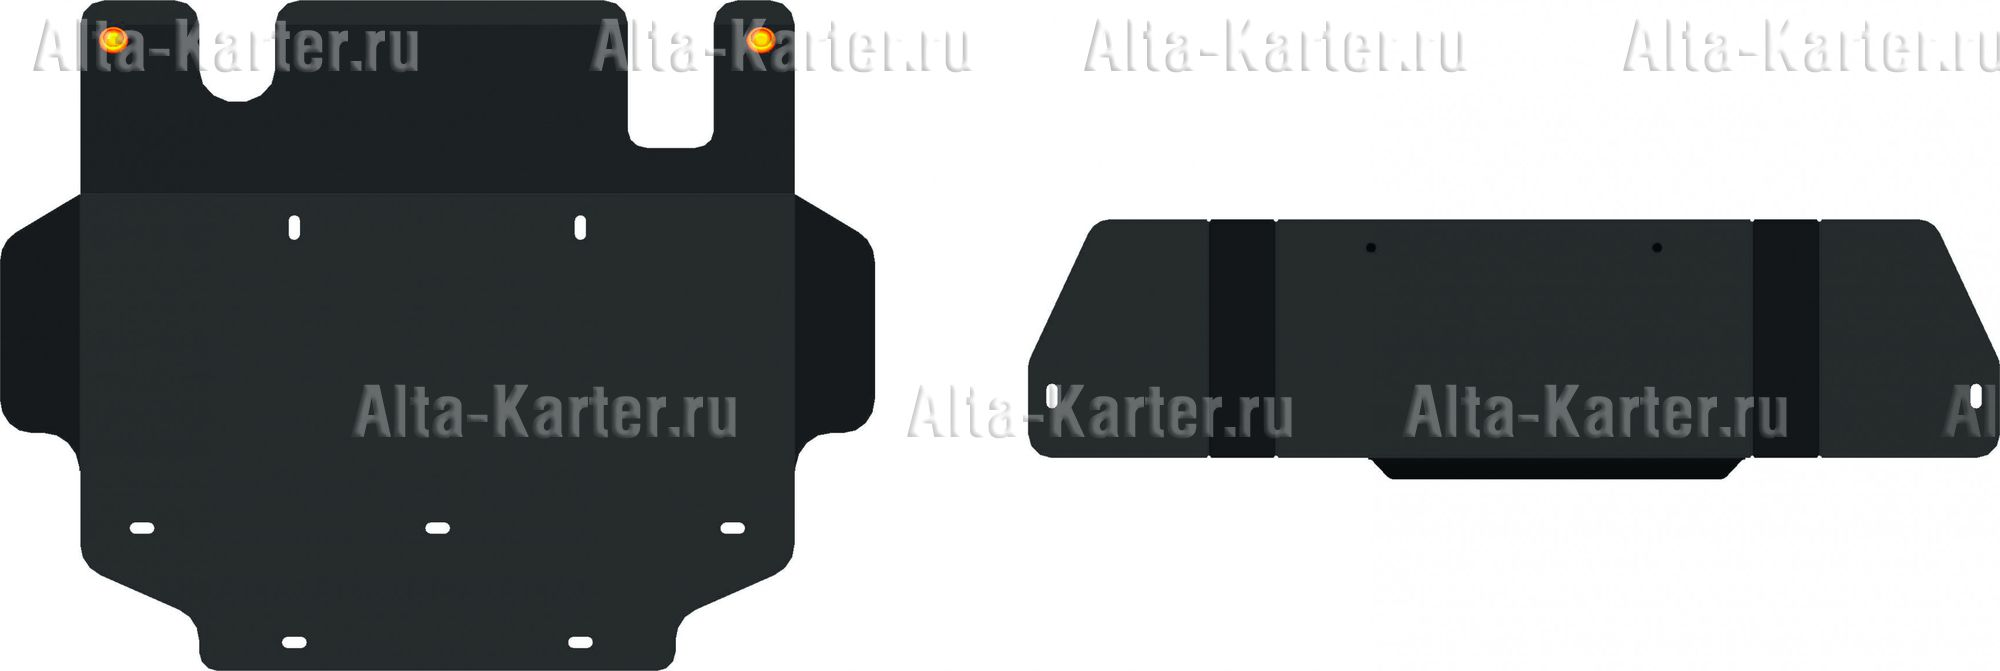 Защита Alfeco для КПП и РК Nissan Patrol Y61 (3-дв. 3.0 TD) 2000-2010. Артикул ALF.15.26